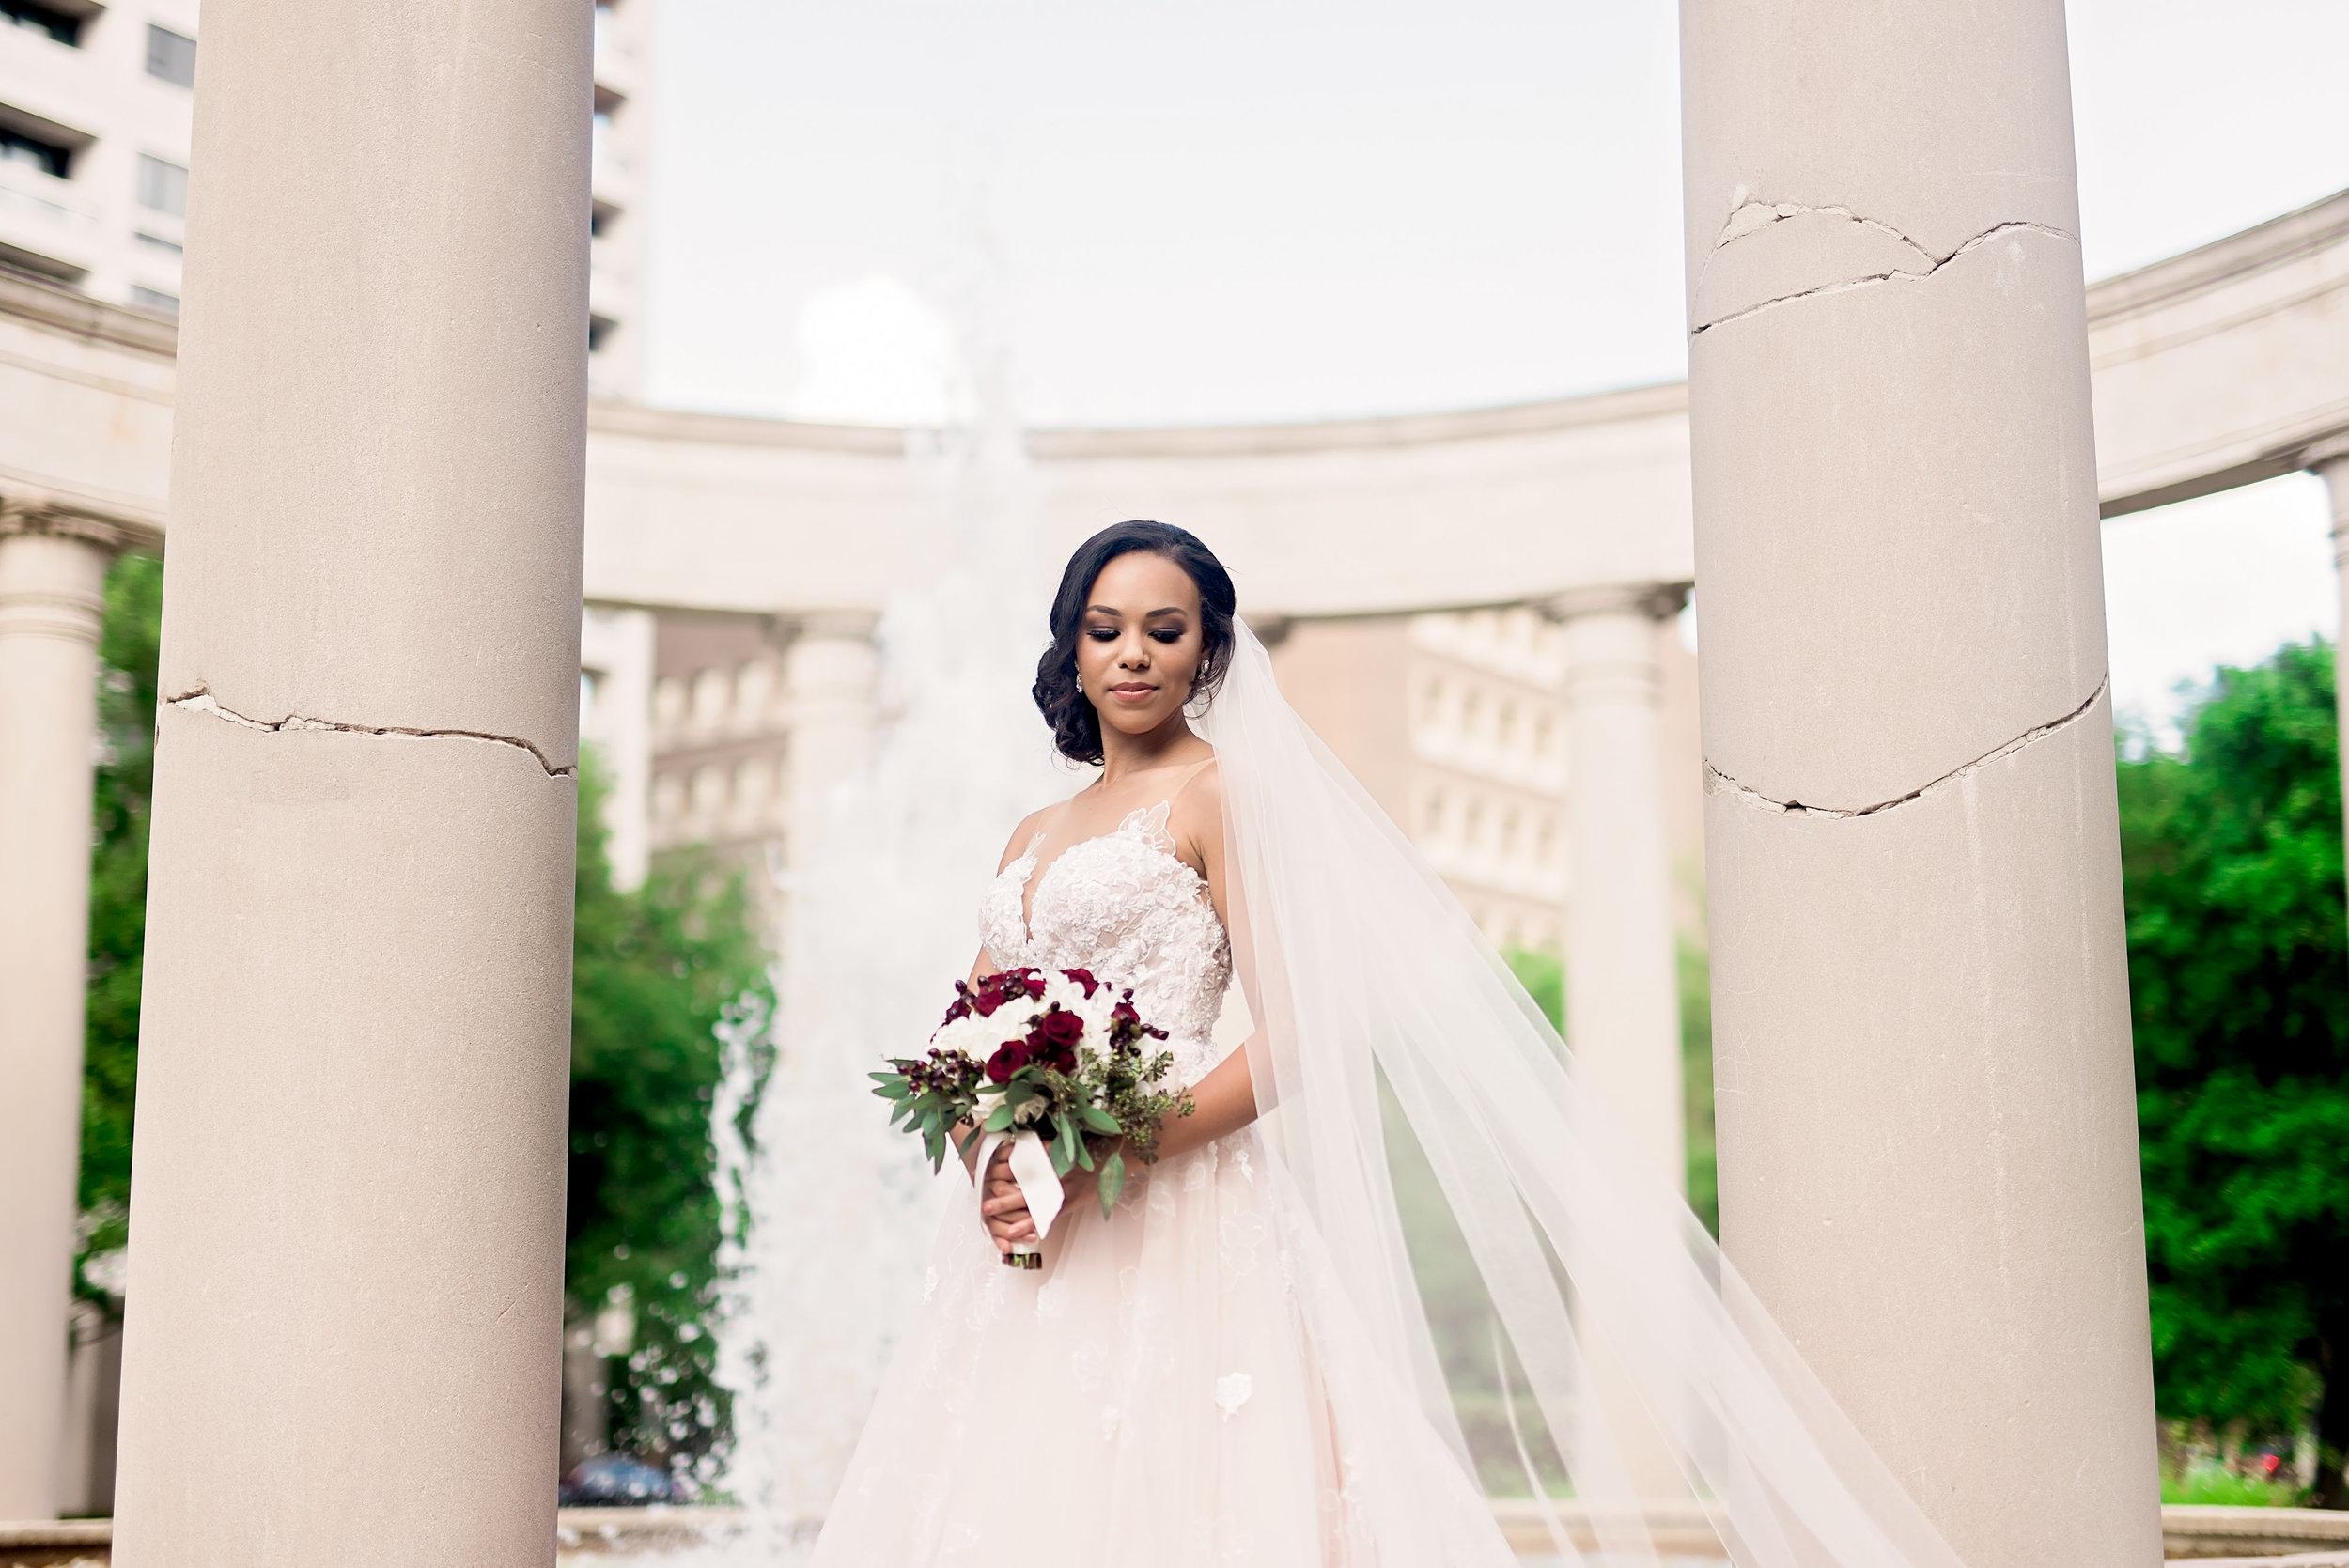 Taylor-bridal-Pharris-Photography-47.jpg